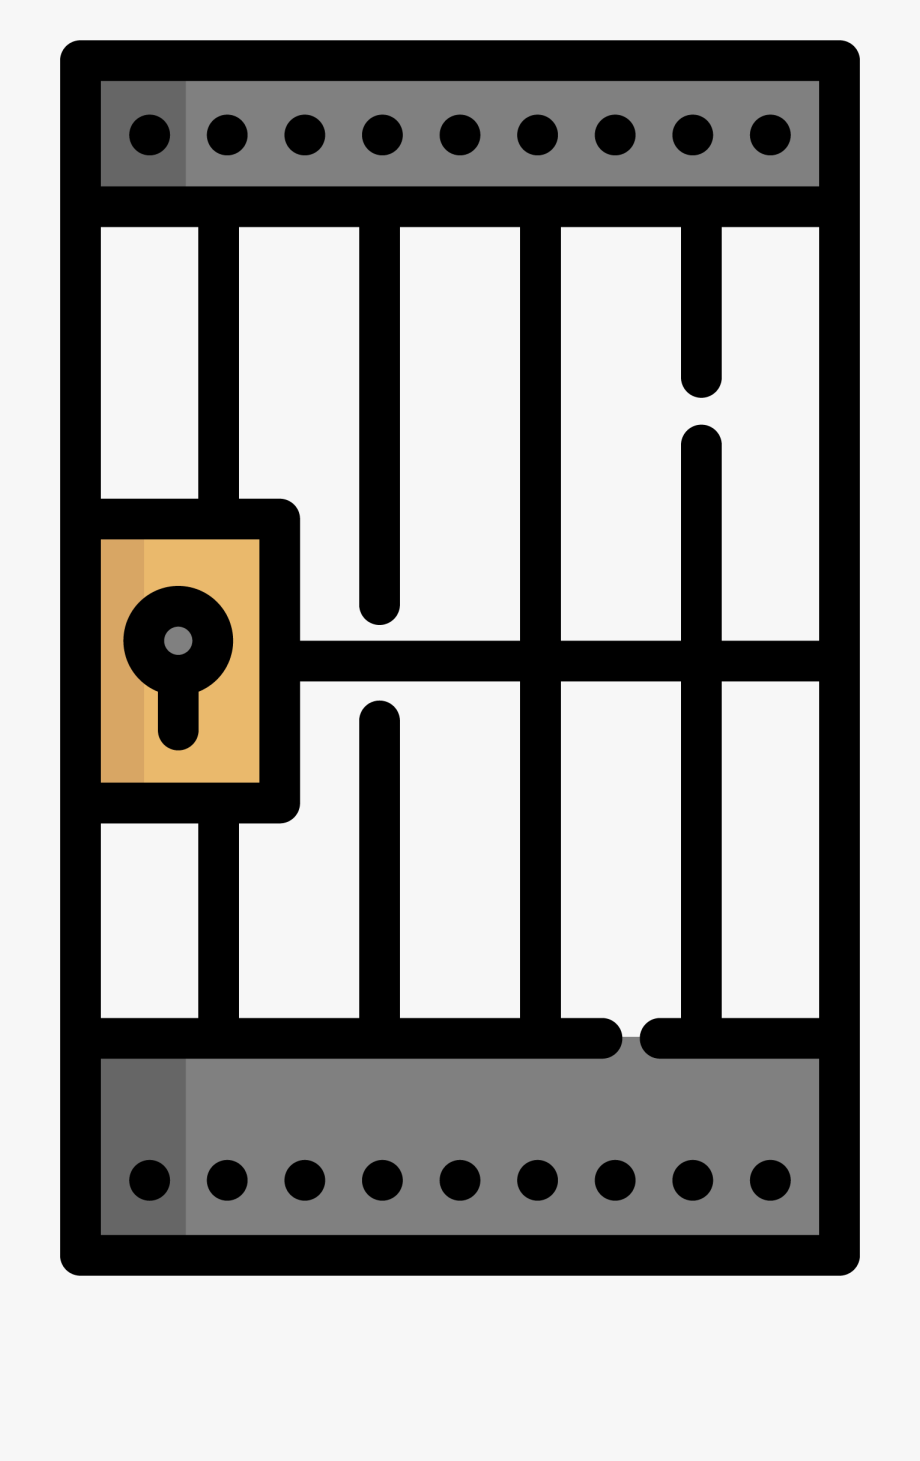 Prison Police Station No U.